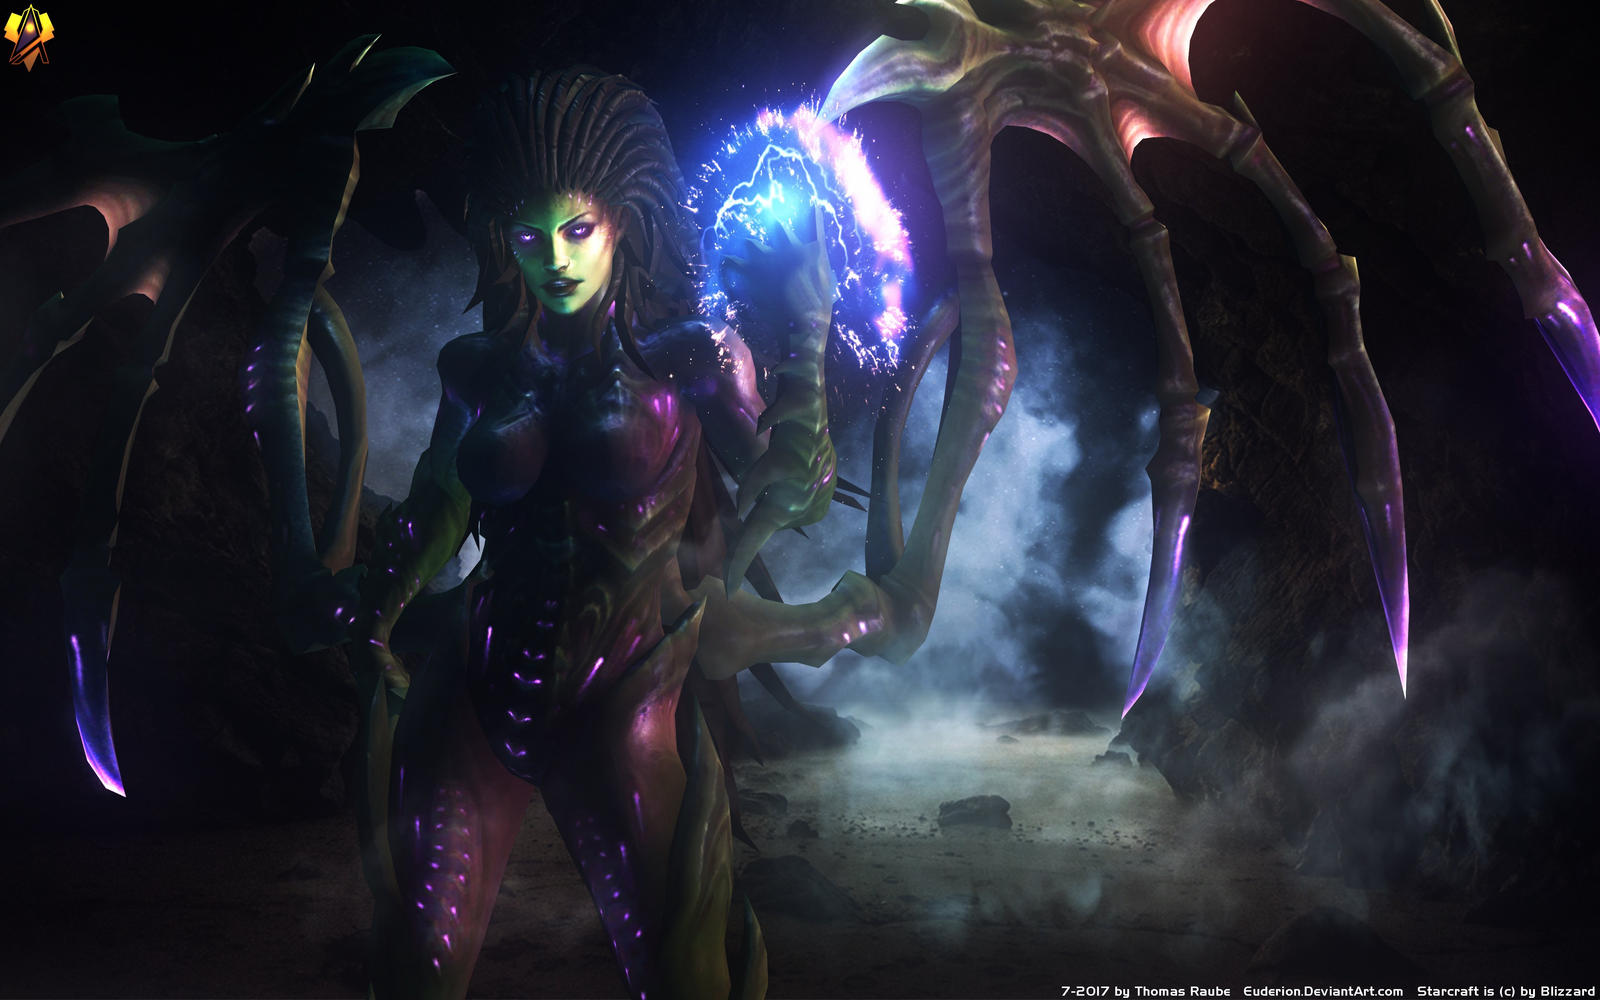 Wallpapers StarCraft Monsters Queen of Blades, Sarah